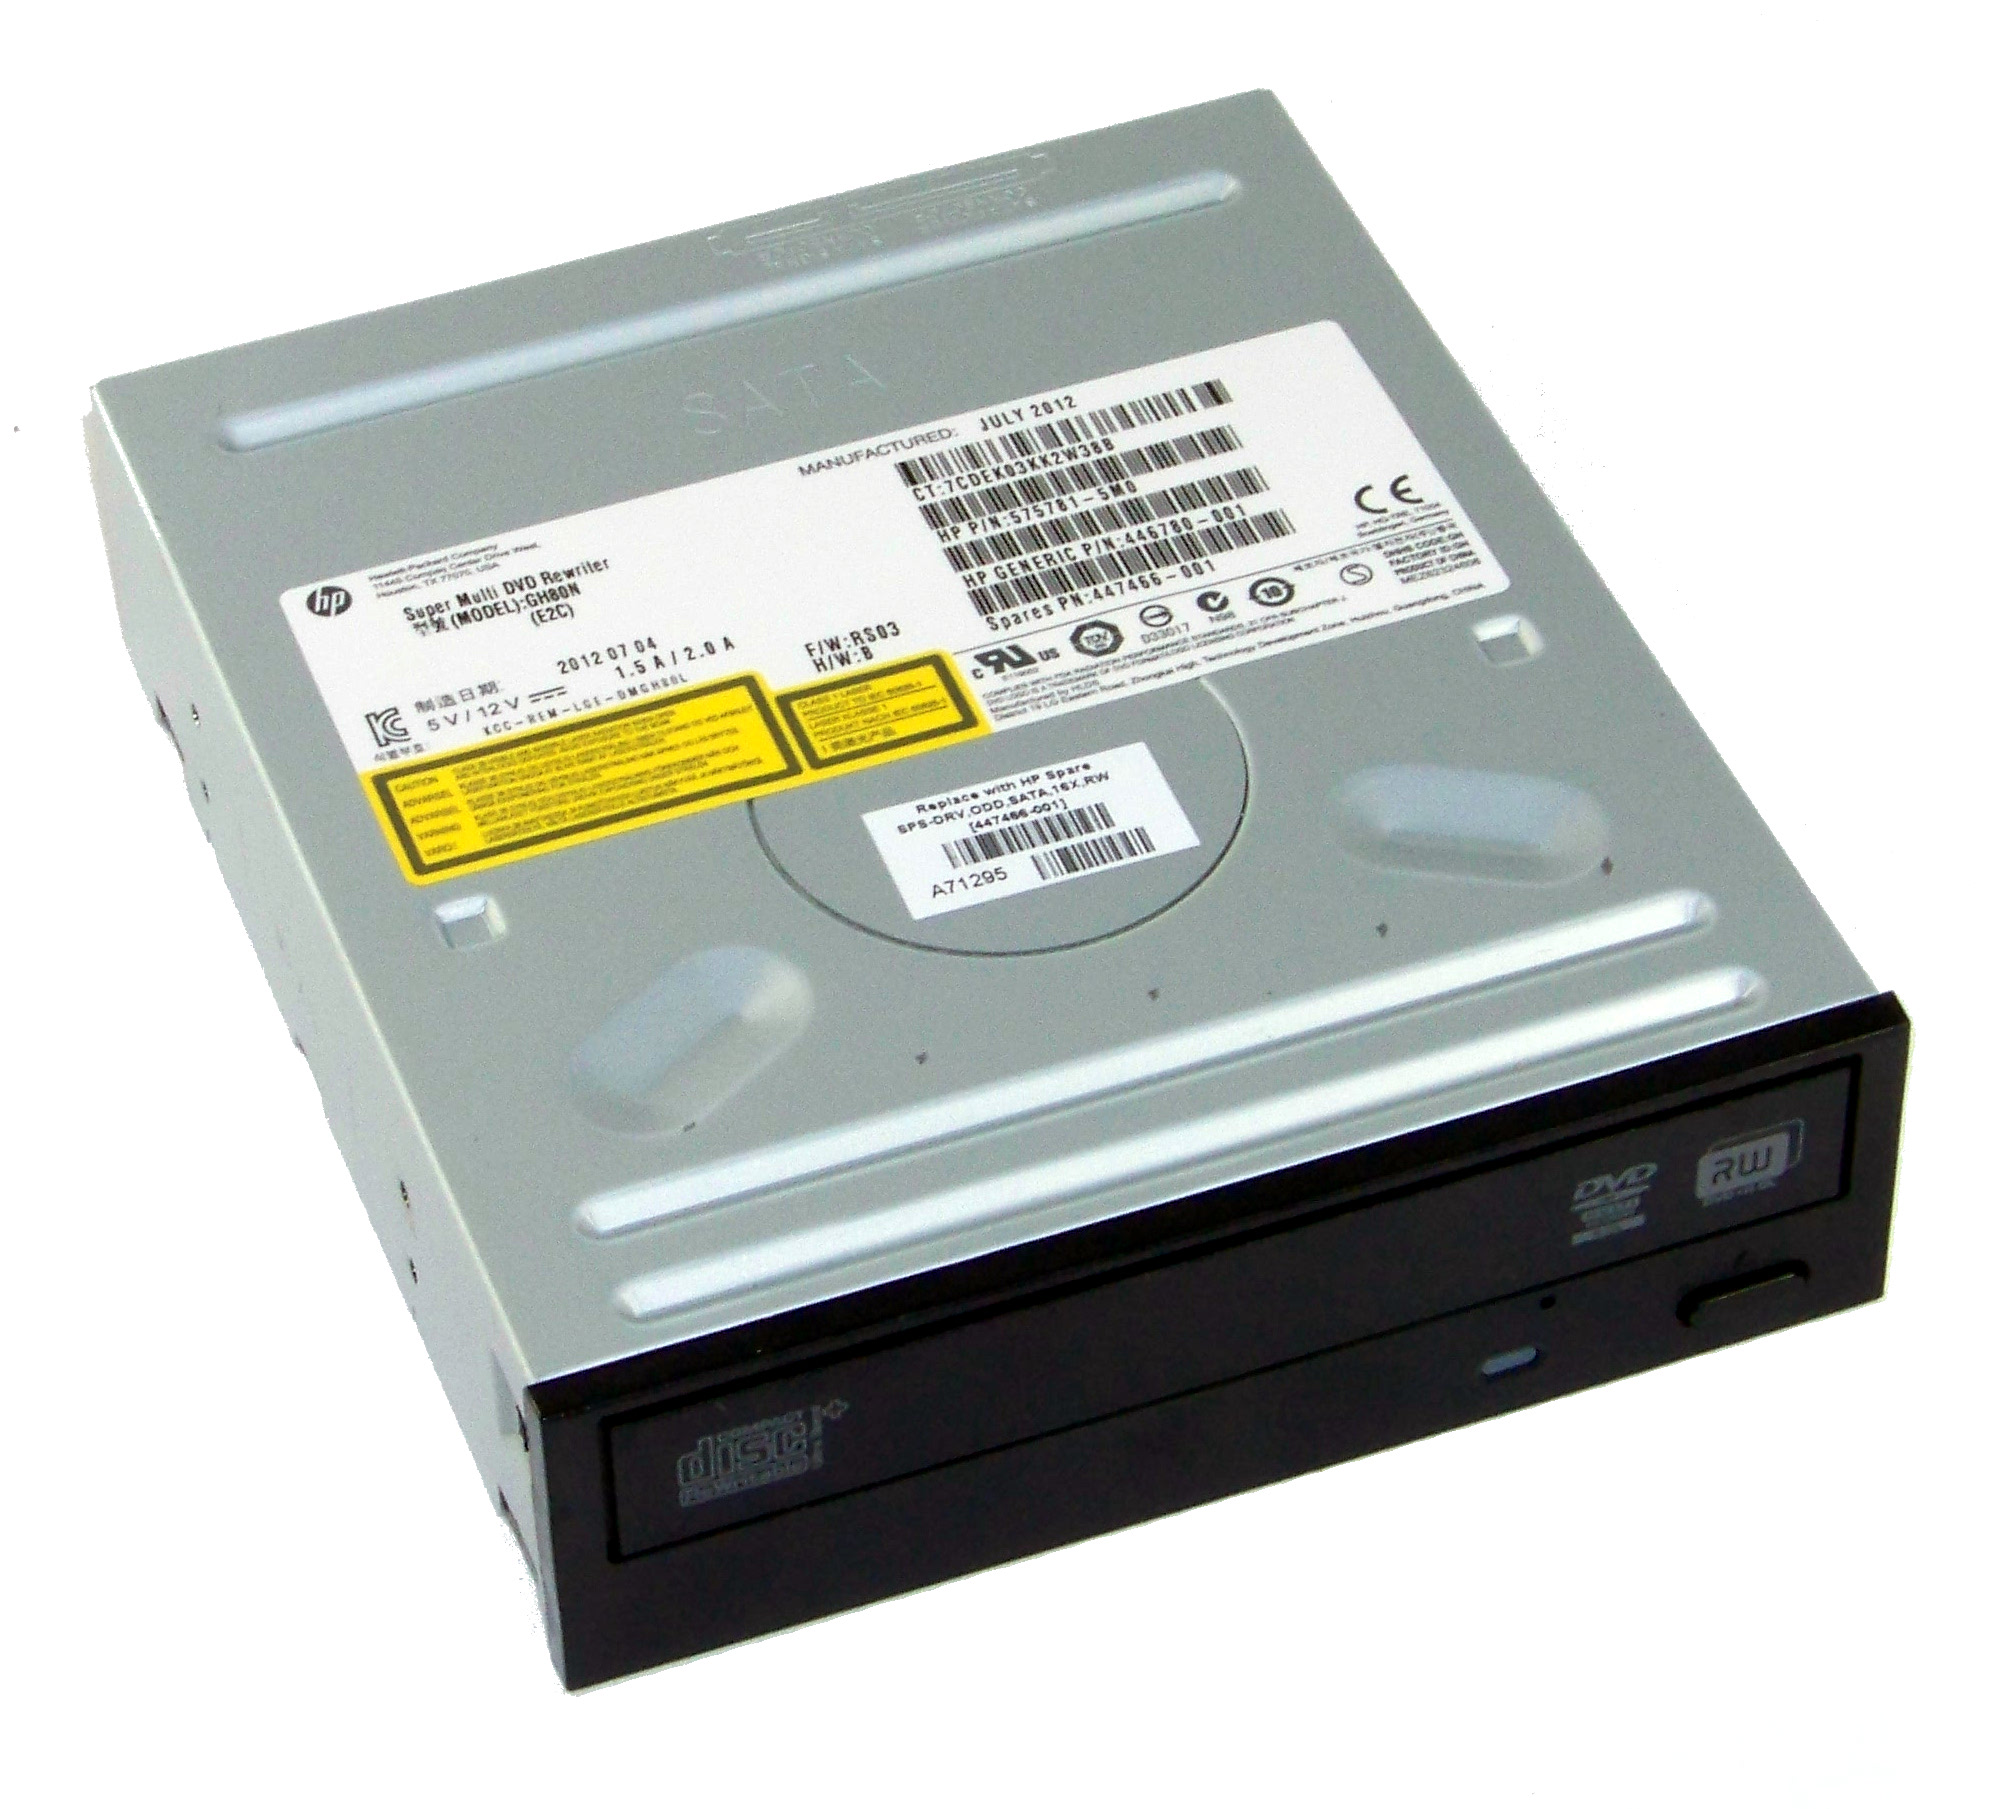 DVD//16X SATA DVD-RW OPTICAL DRIVE HALF HEIGHT FORM FACTOR HP PART#575781-5M0 HP